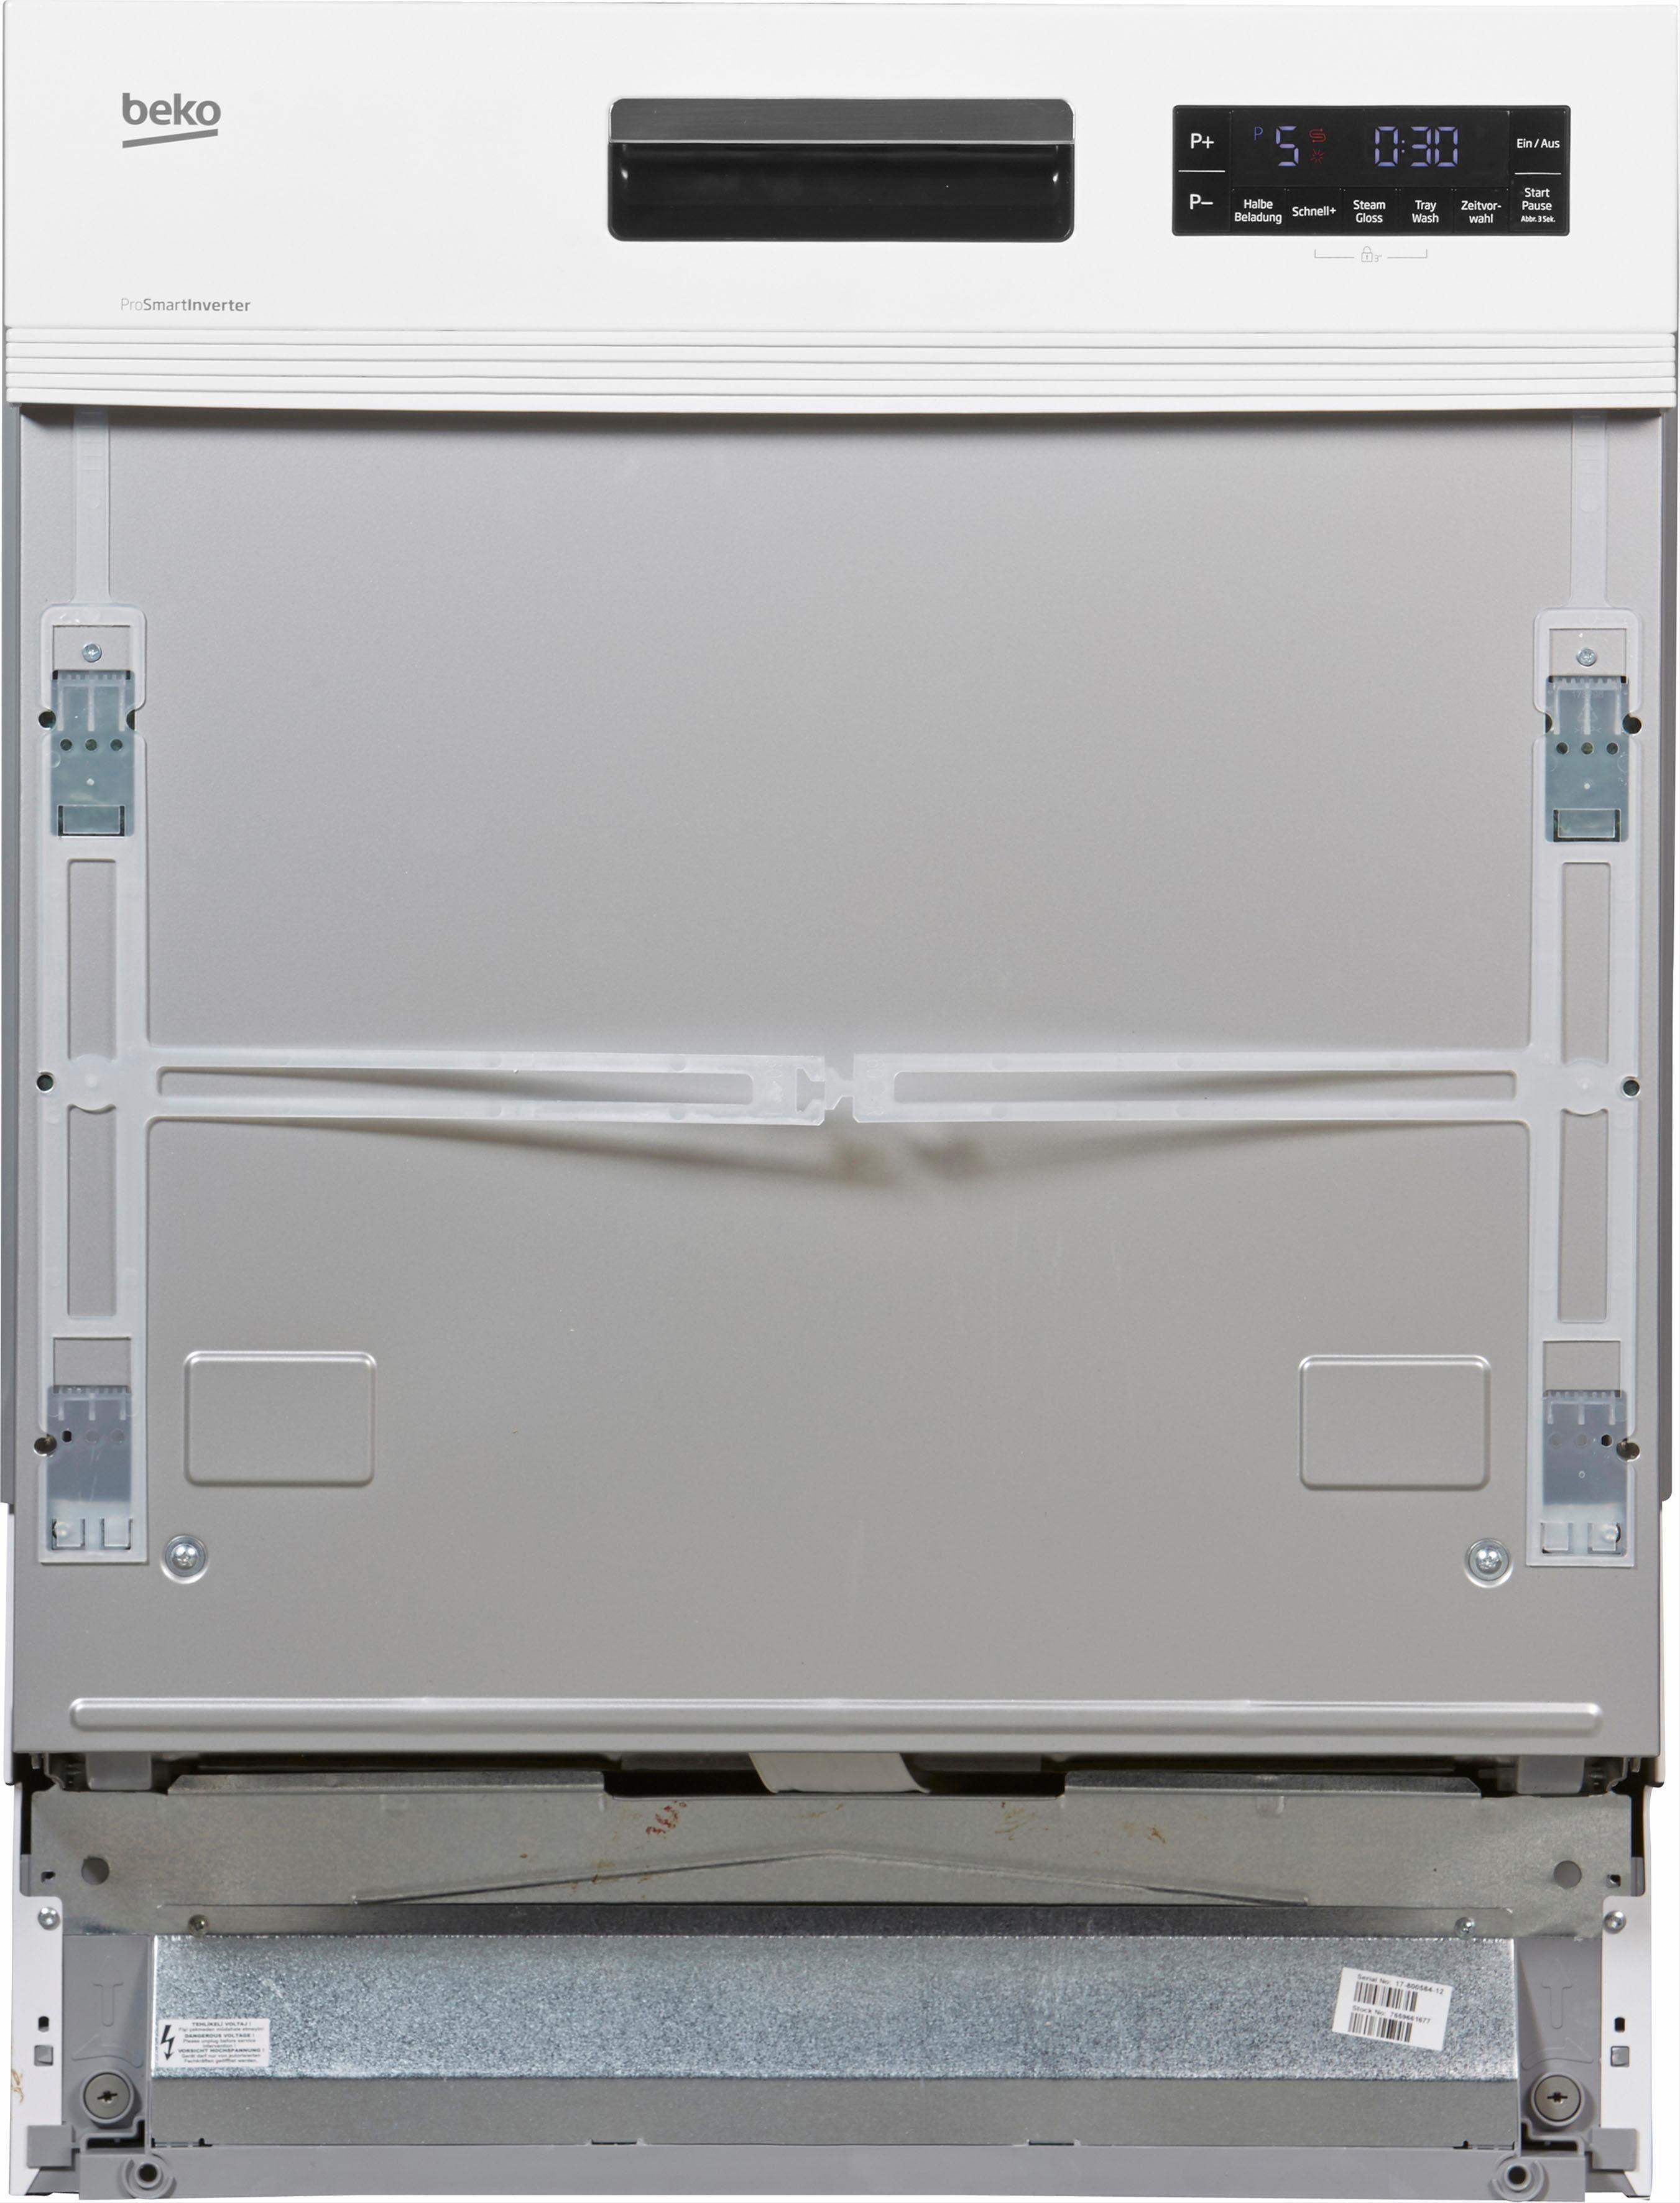 BEKO teilintegrierbarer Geschirrspüler, DSN6634W2, 9,5 l, 14 Maßgedecke